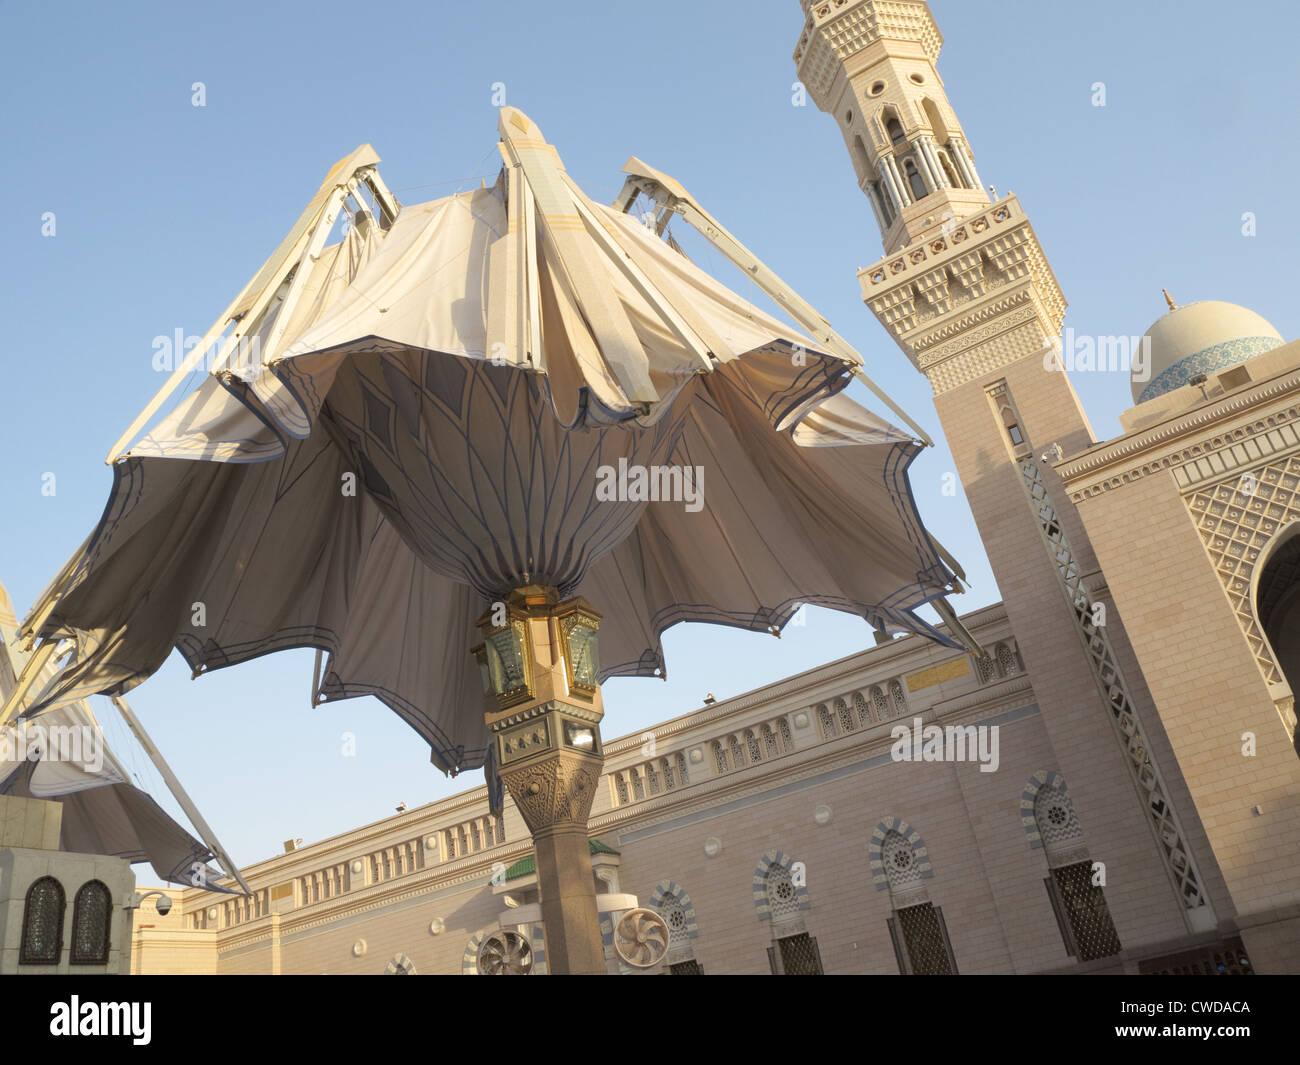 The giant size automated umbrella closing at An Nabawi Mosque, Al Madinah, Saudi Arabia - Stock Image